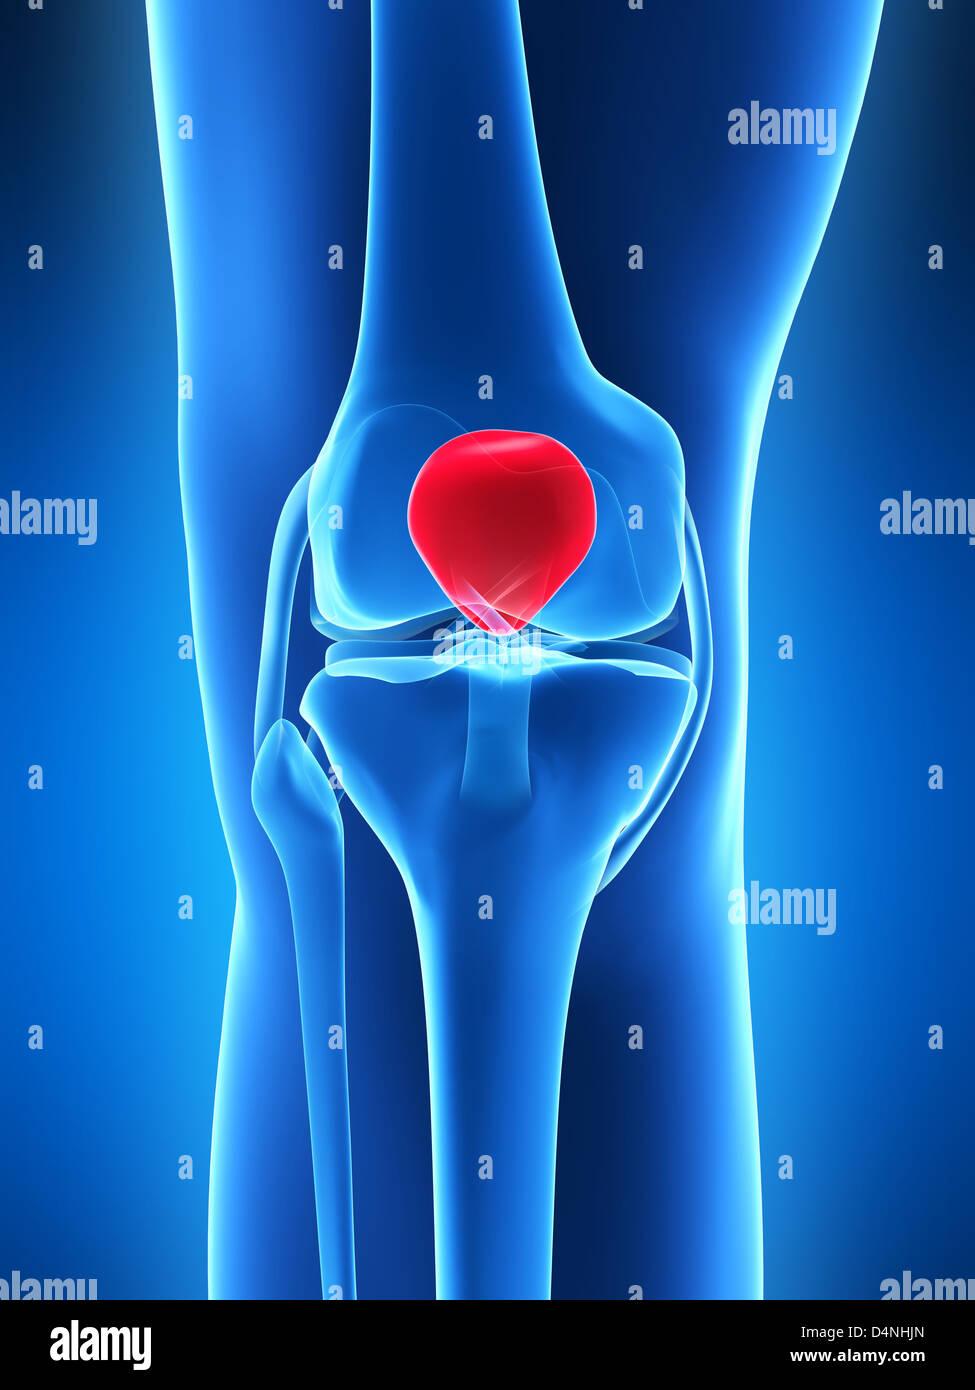 Human Shin Bone And Ligament Stock Photos & Human Shin Bone And ...